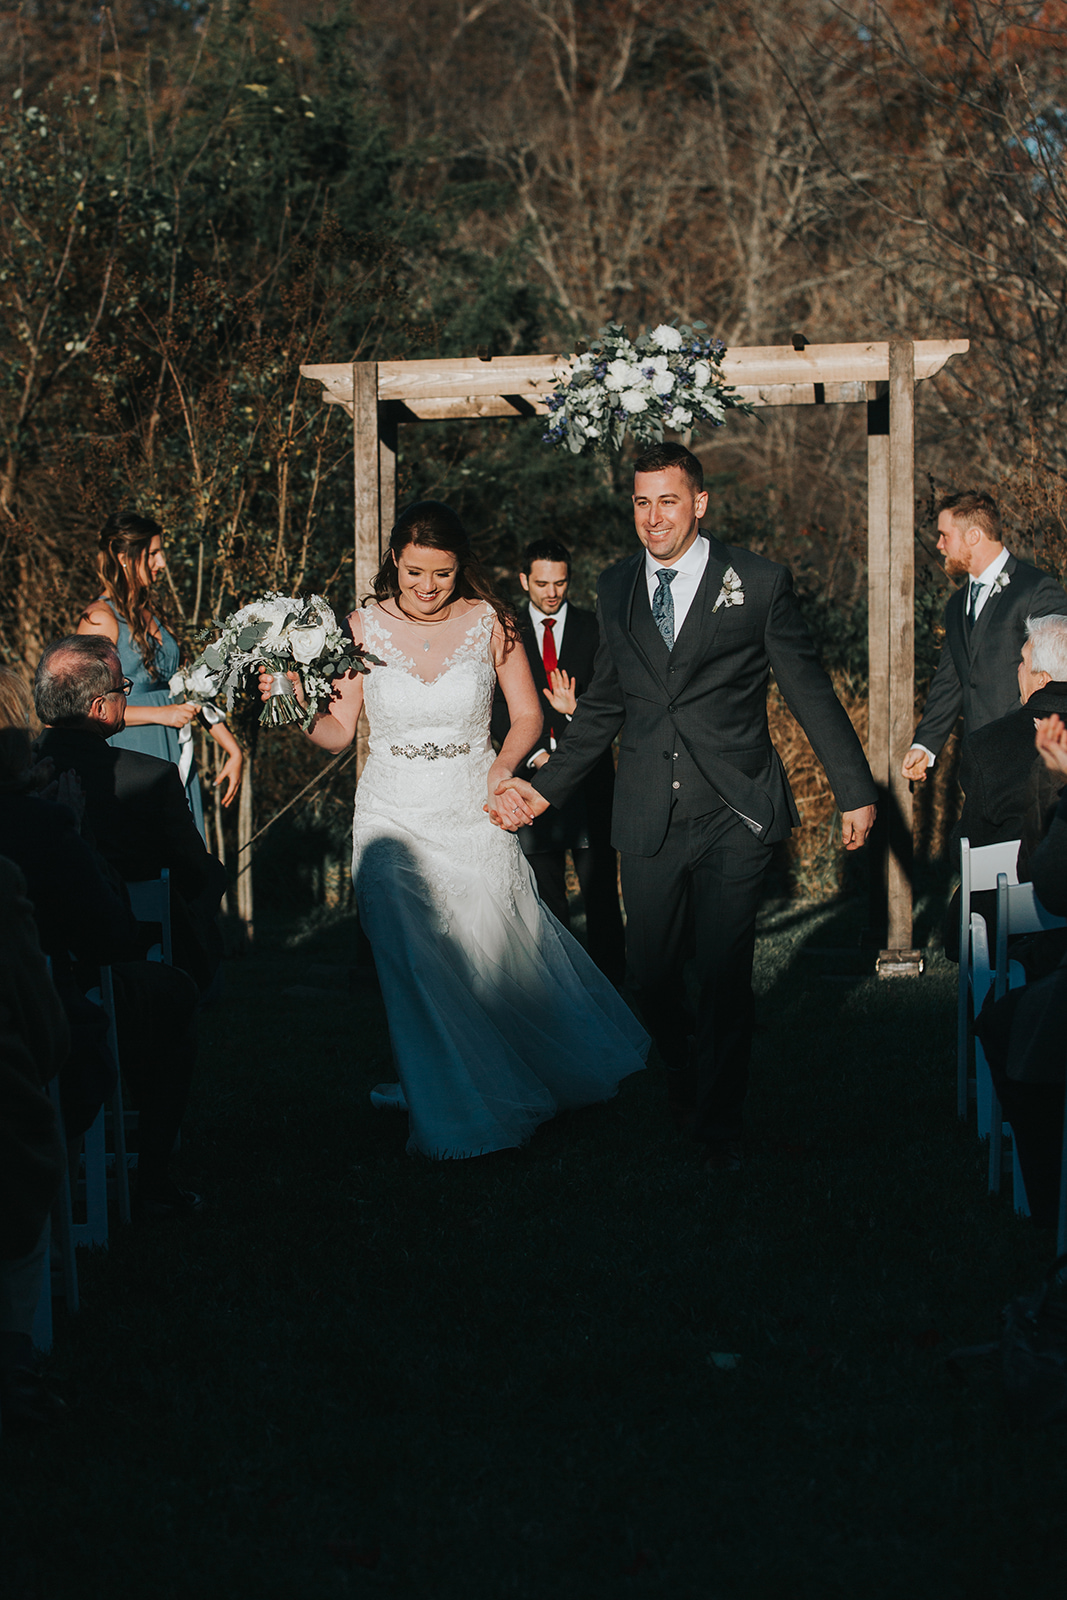 brielle-davis-events-48-fields-wedding-ceremony-recessional.jpg